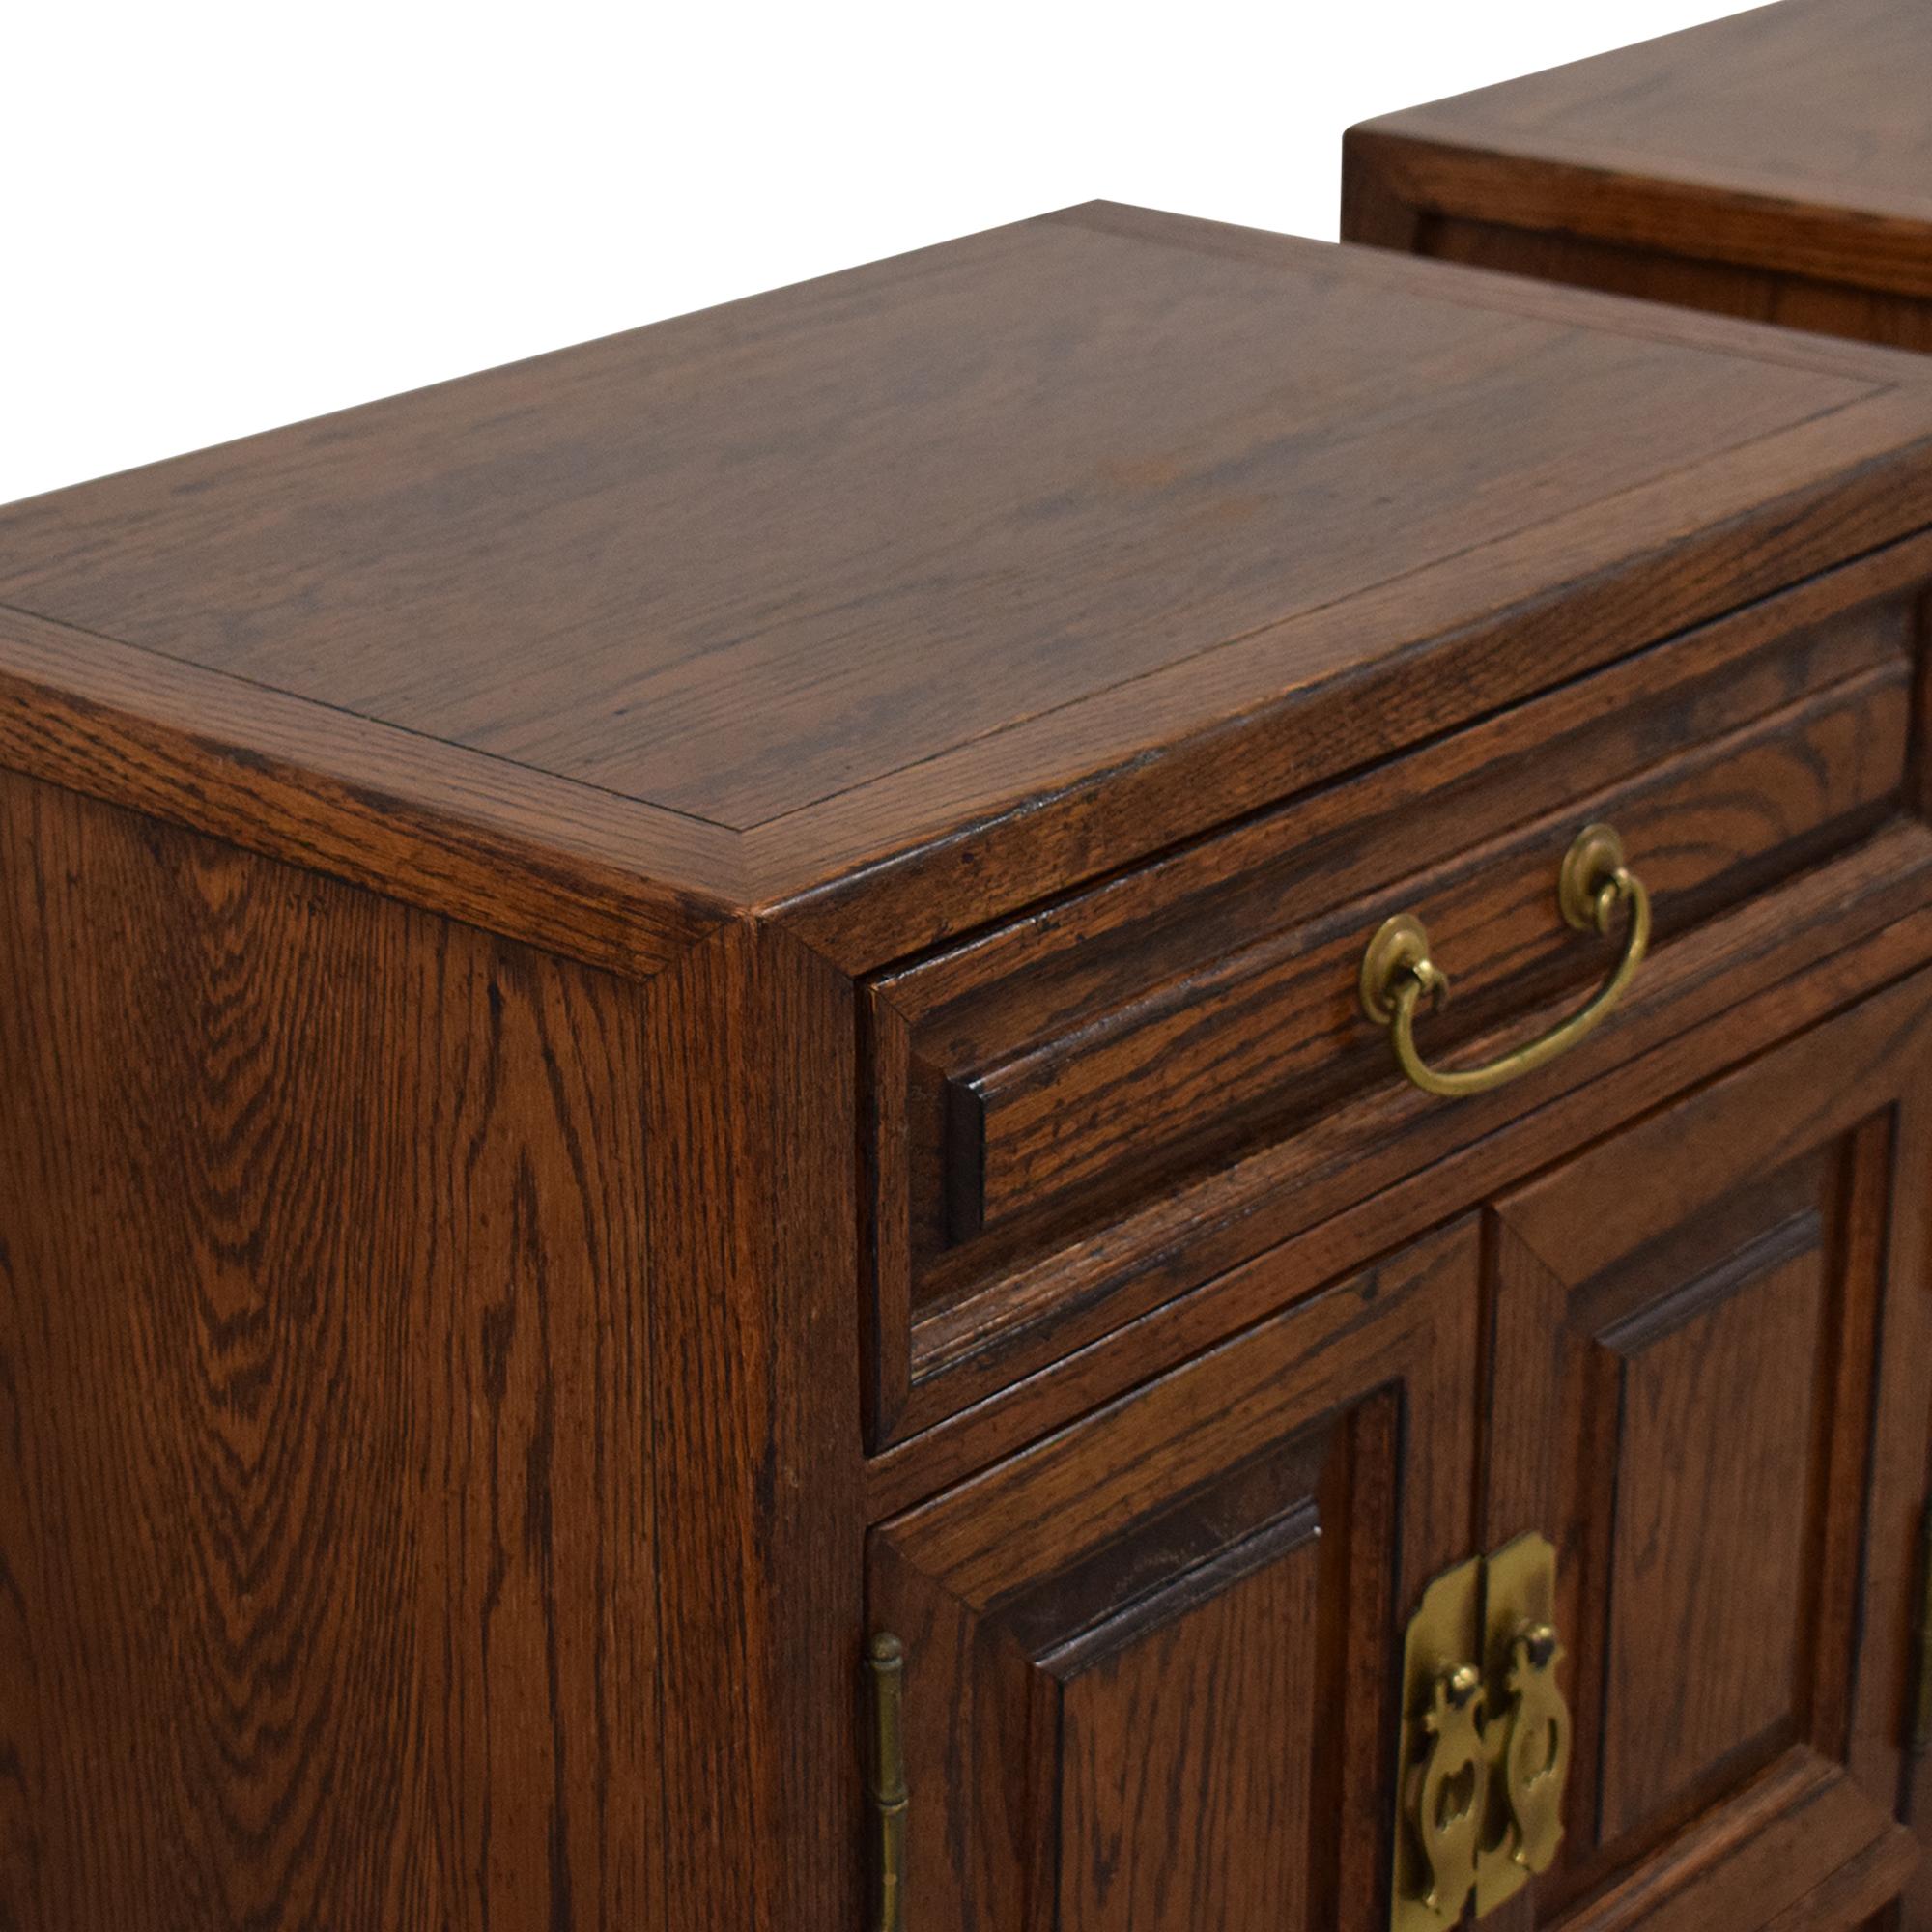 Century Furniture Century Furniture Nightstands price